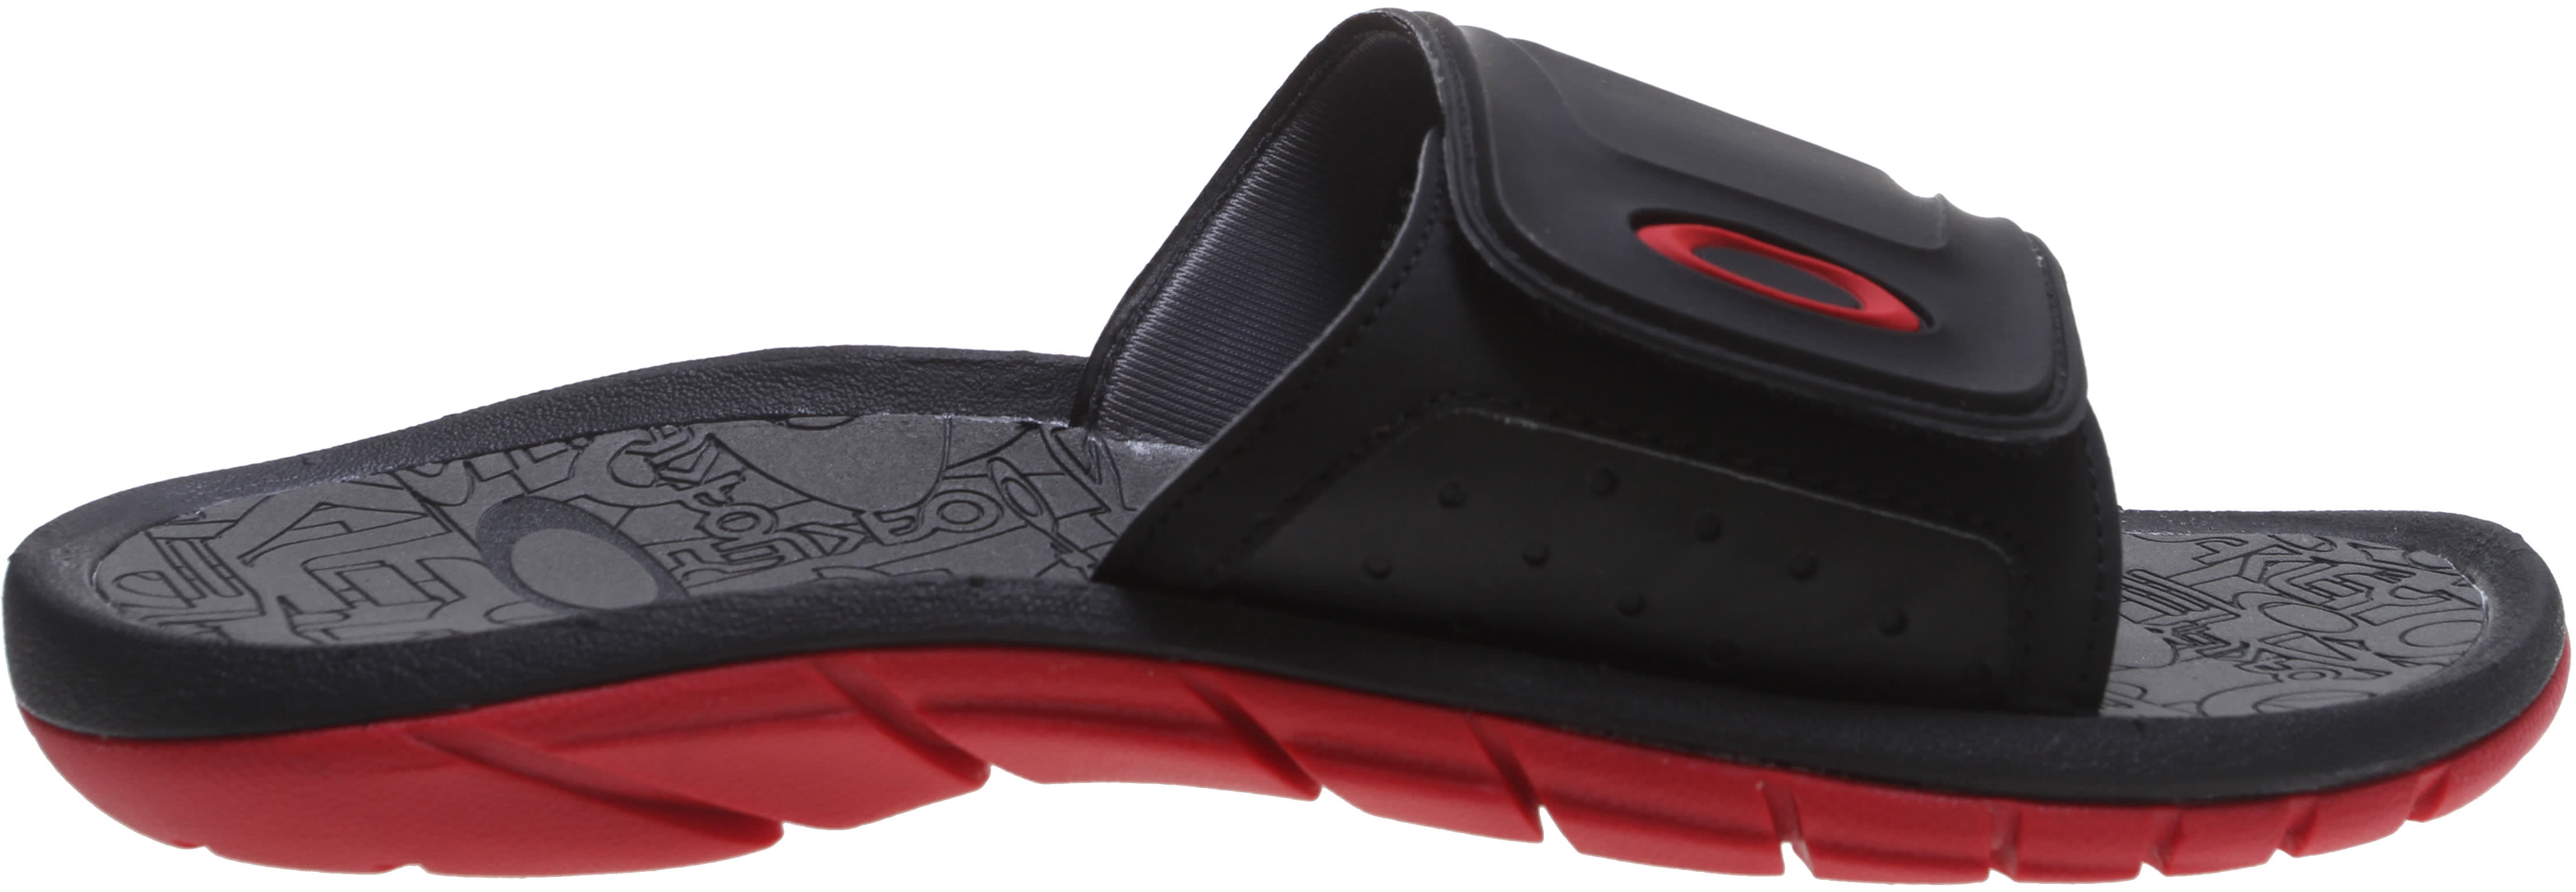 4810641132 Oakley Supercoil Slide Sandals - thumbnail 1